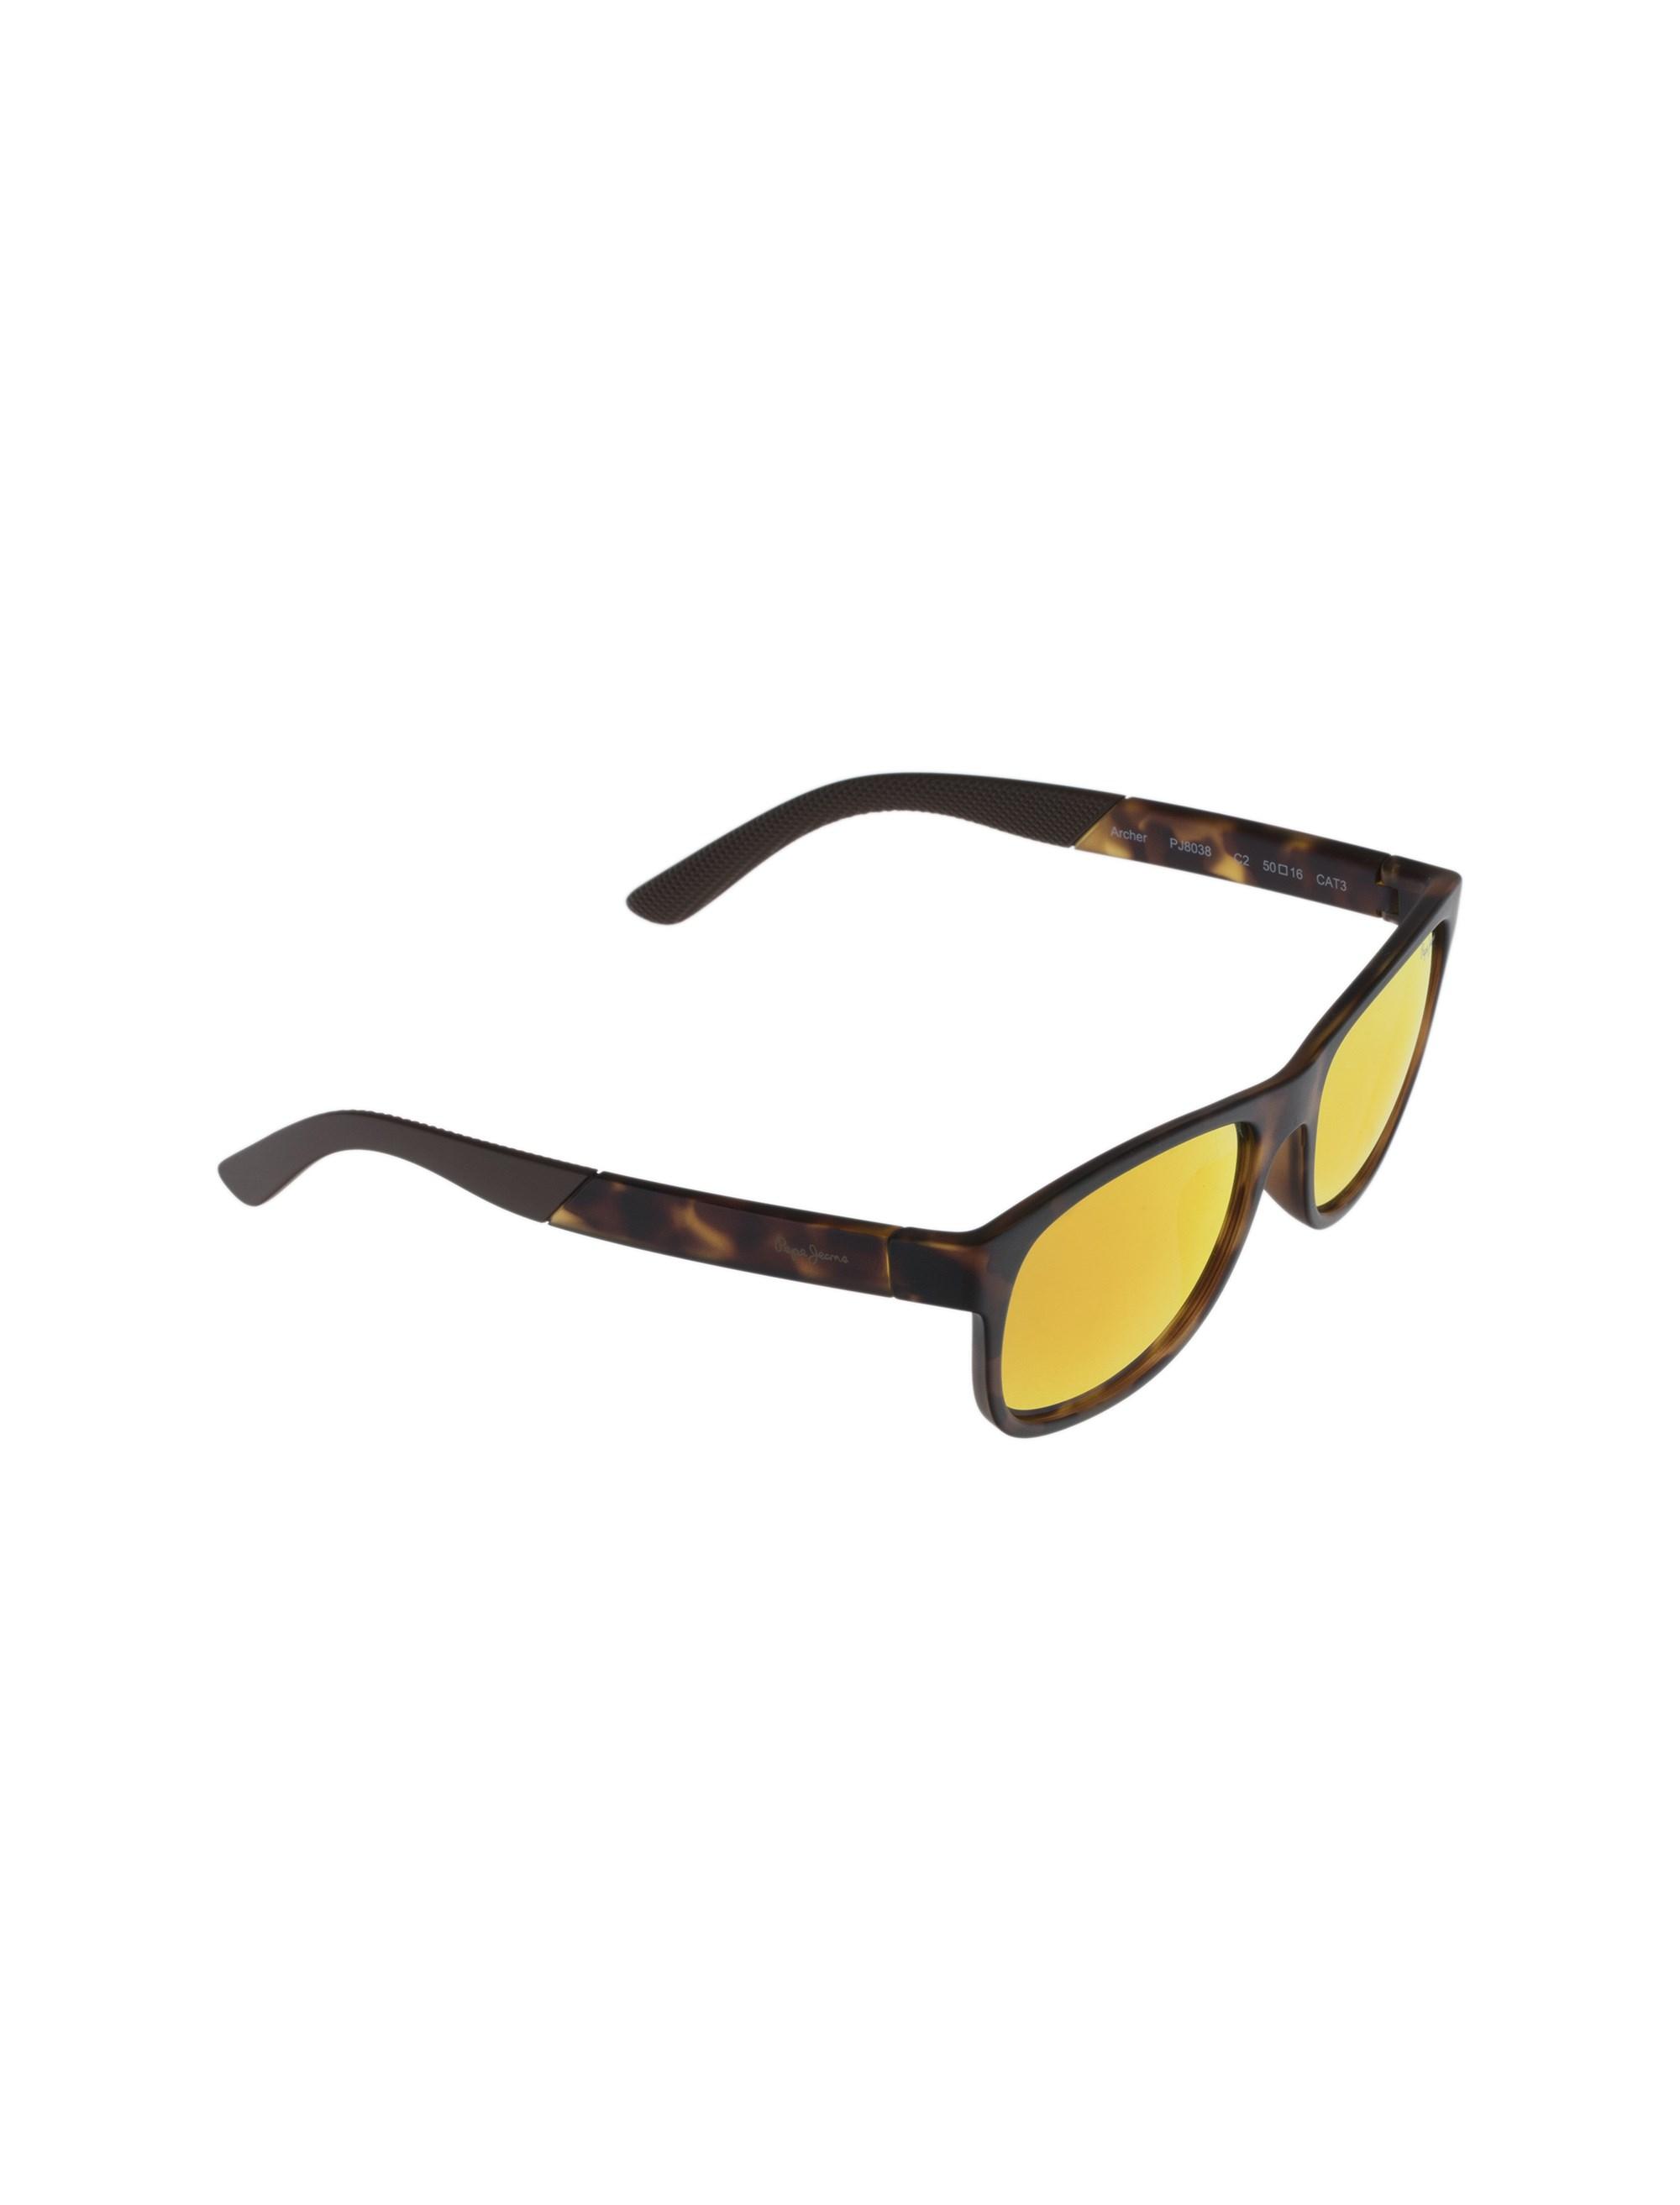 عینک آفتابی ویفرر زنانه - پپه جینز - قهوه اي لاک پشتي - 2